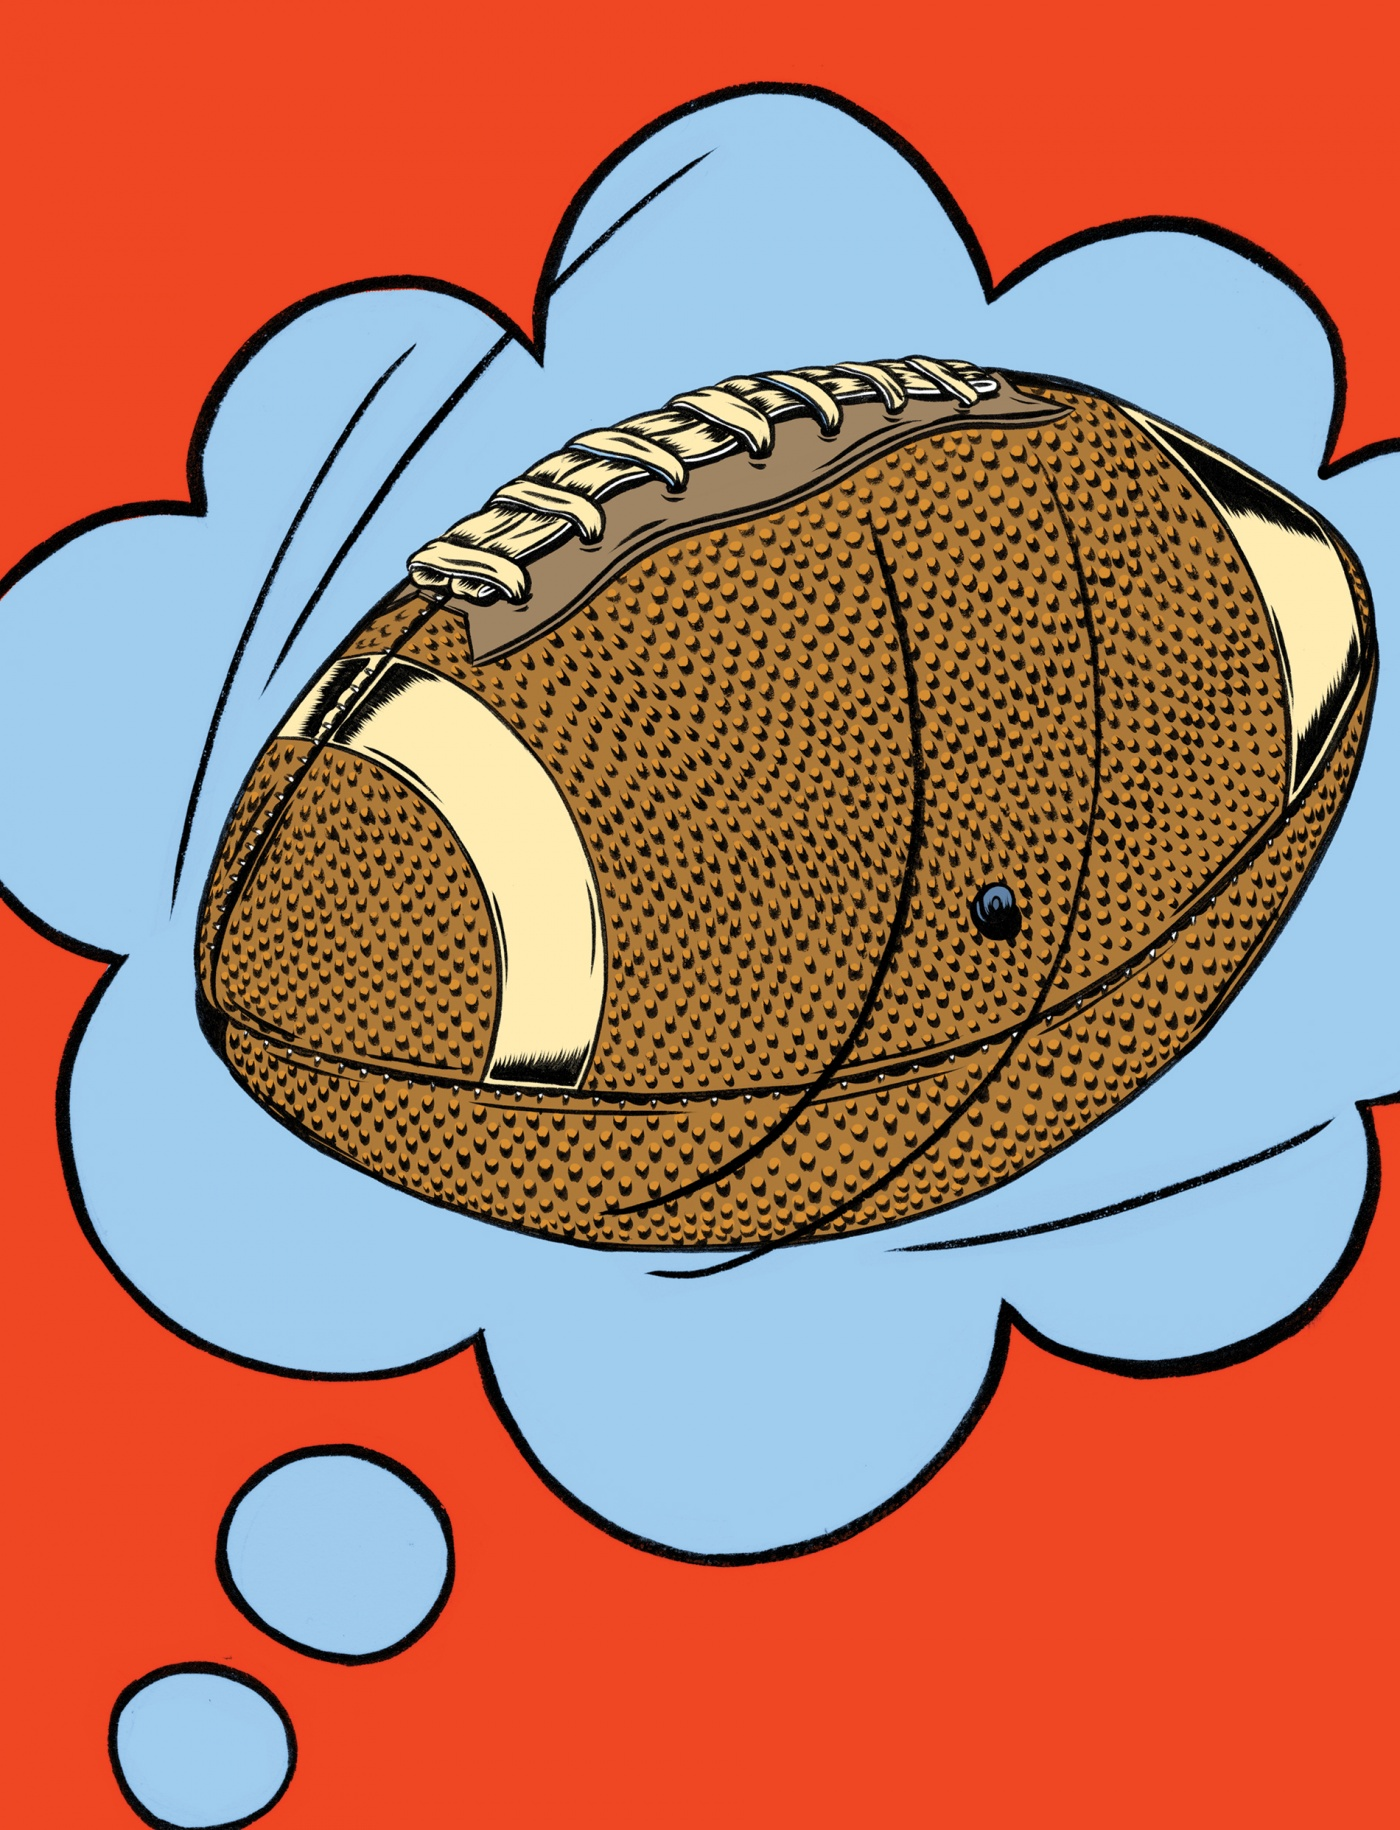 Illustration of football in a dream bubble by Kelsey Dake